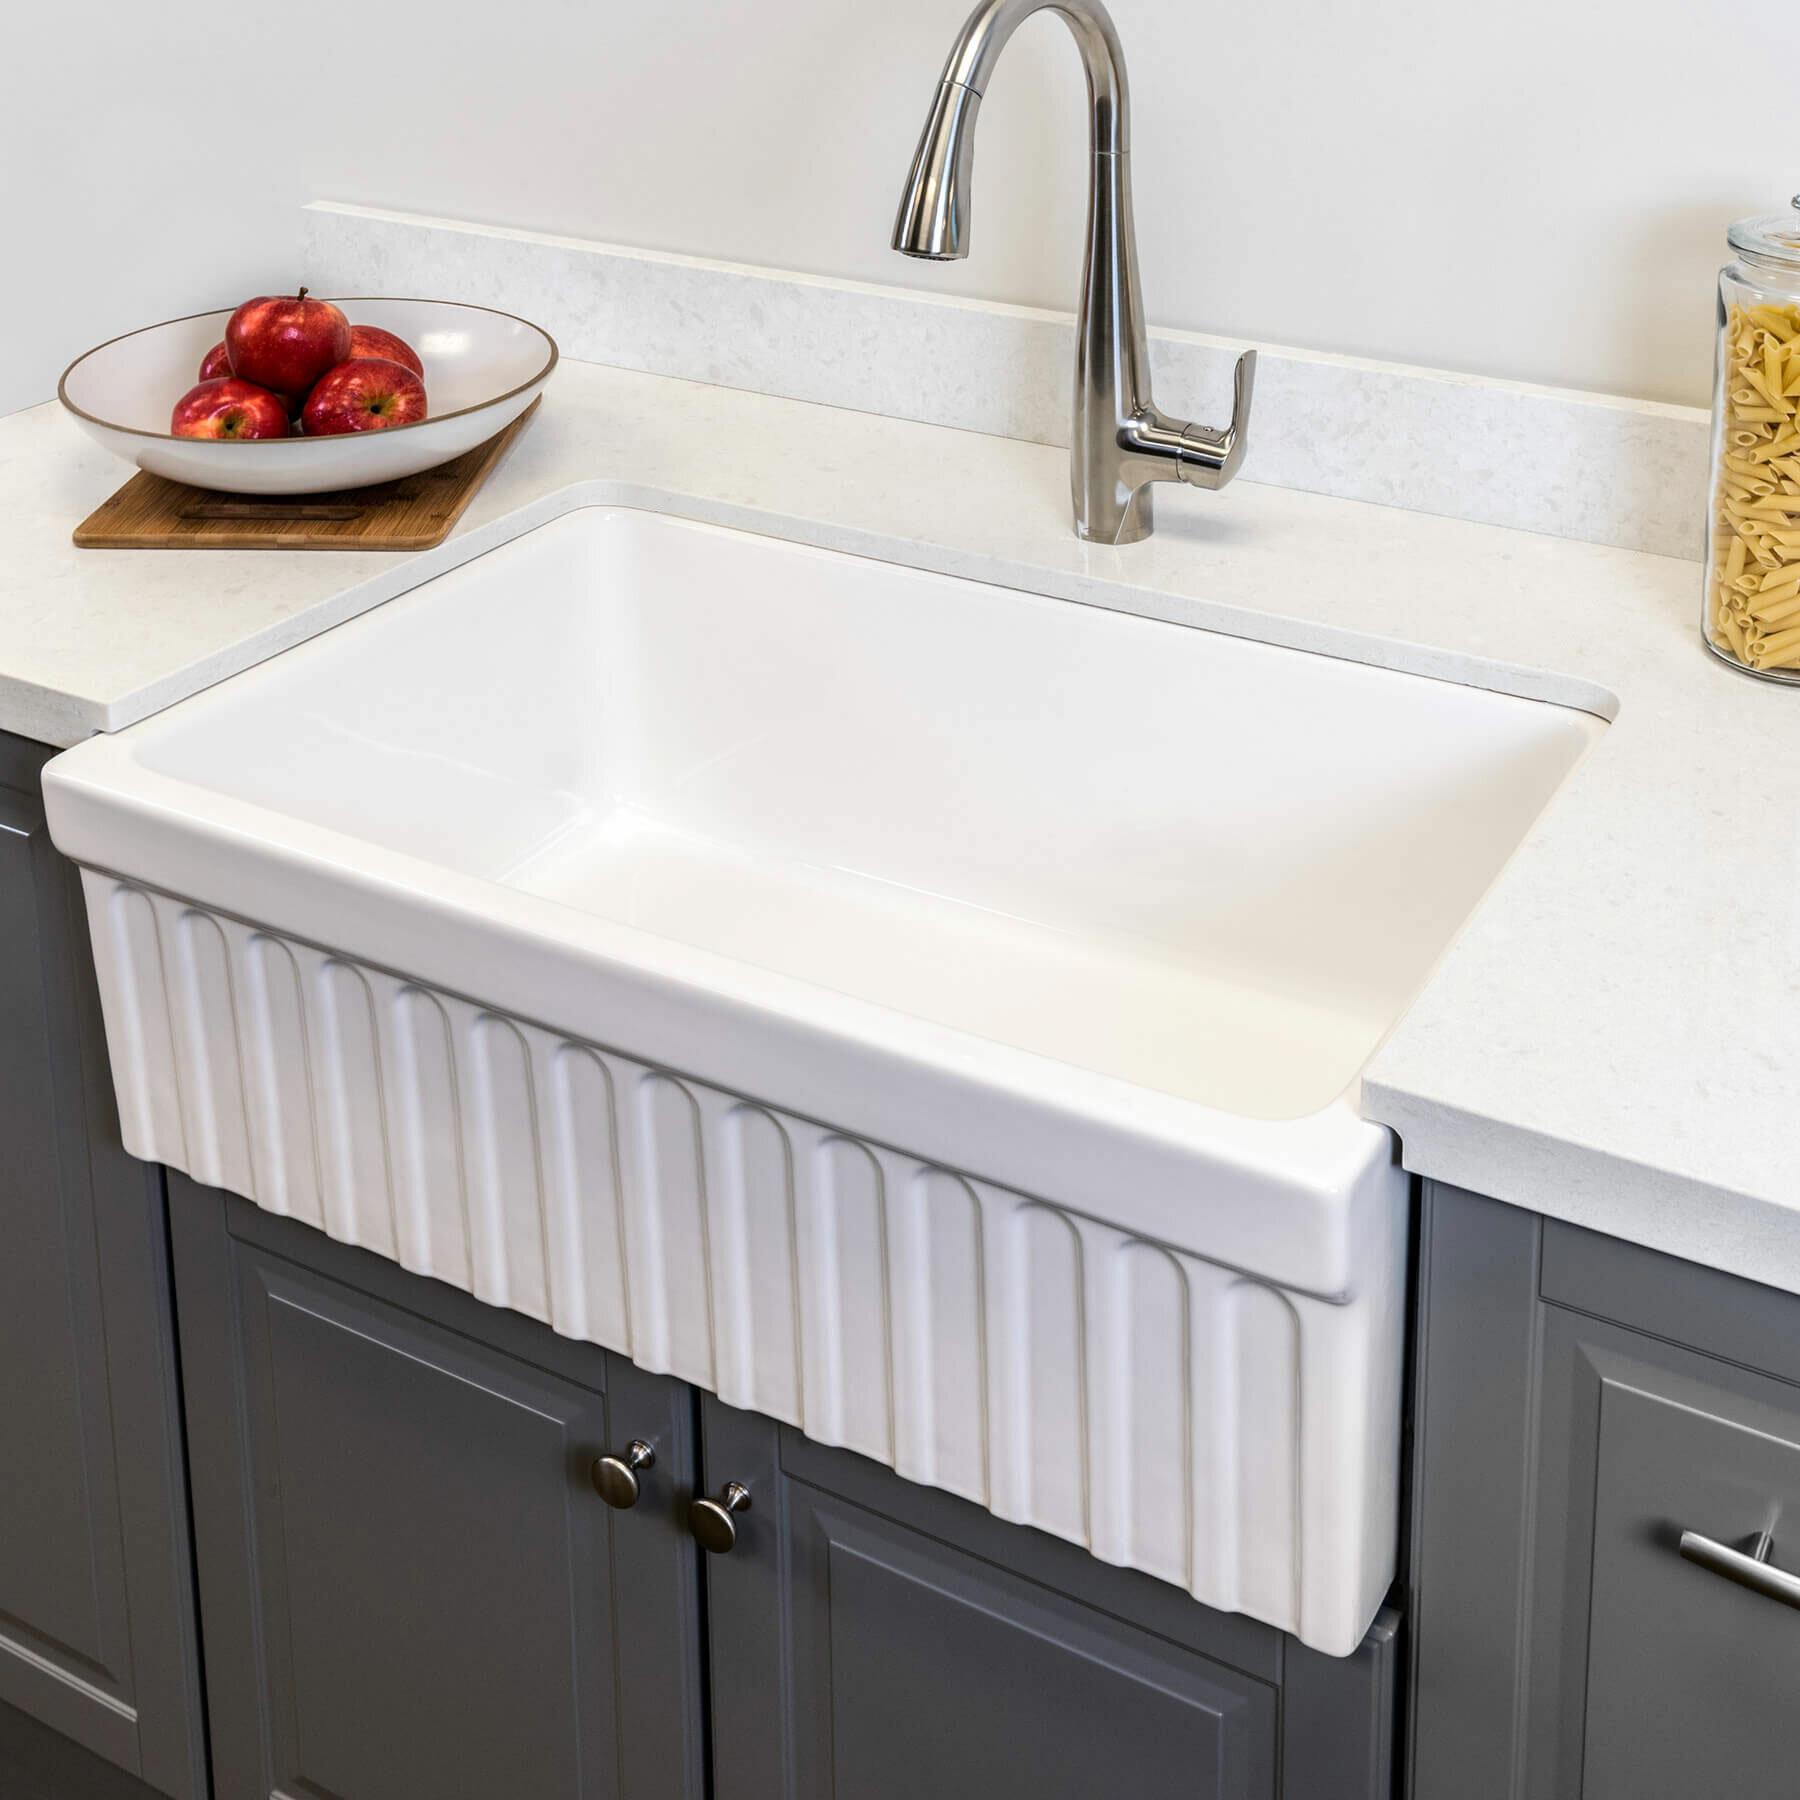 Maykke Victoria Fluted Fireclay 30 L X 20 W Farmhouse Kitchen Sink Wayfair